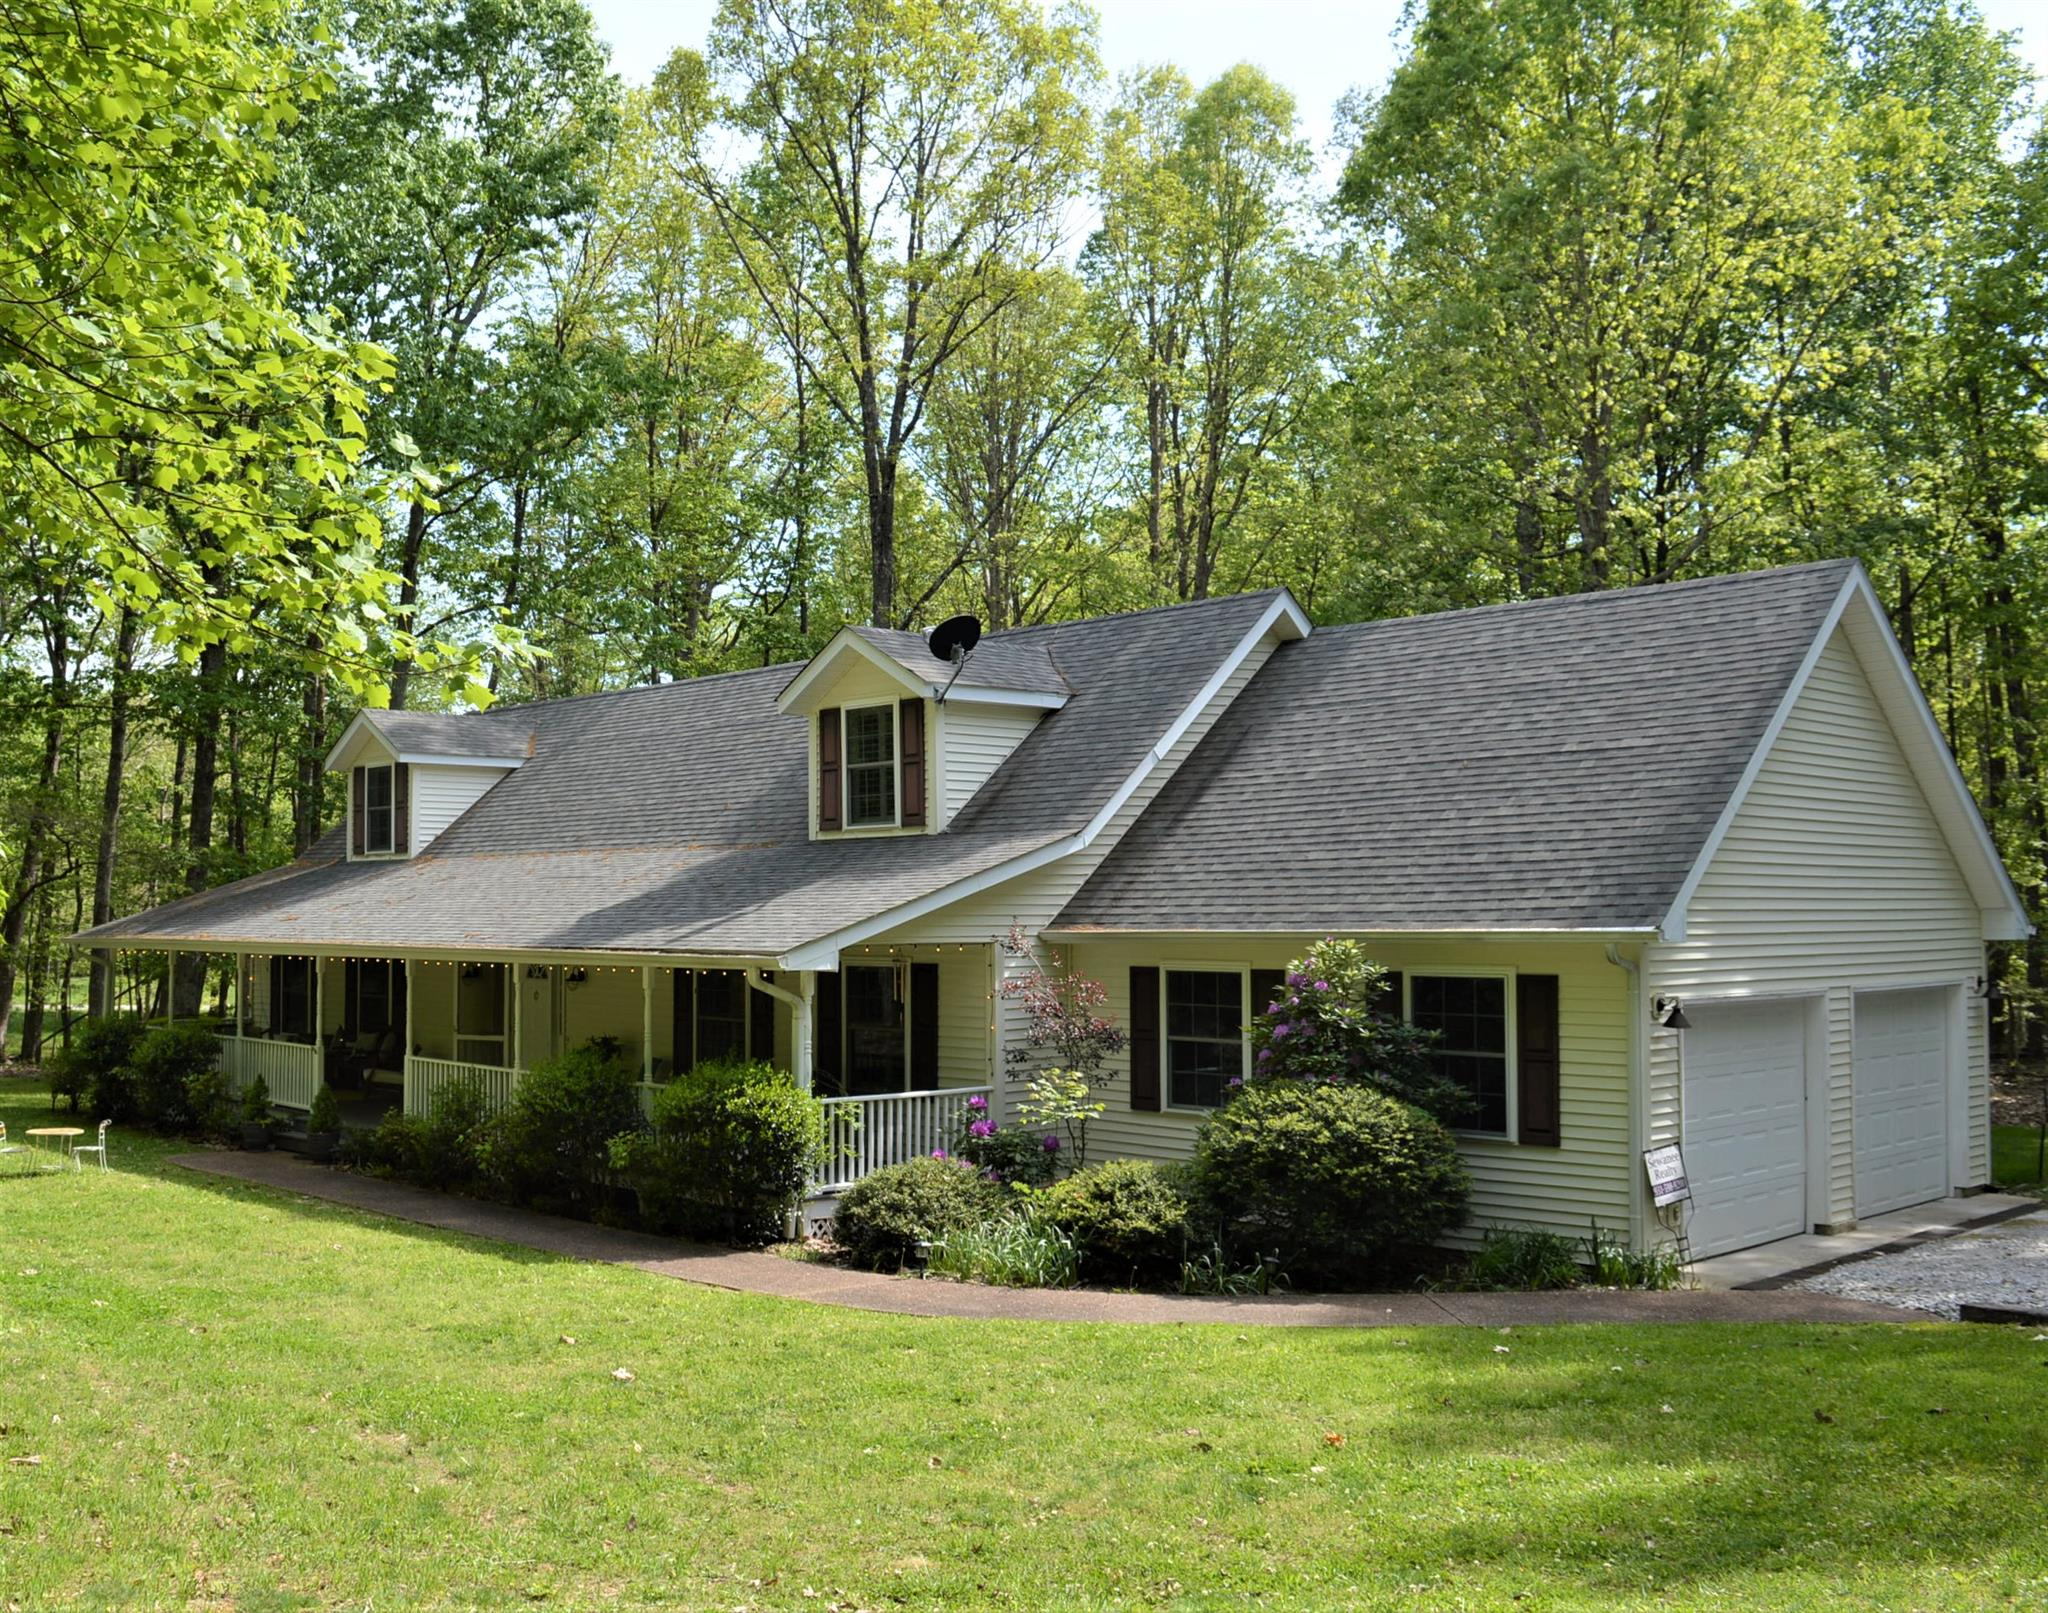 310 Wiggins Creek Drive, Sewanee, TN 37375 - Sewanee, TN real estate listing